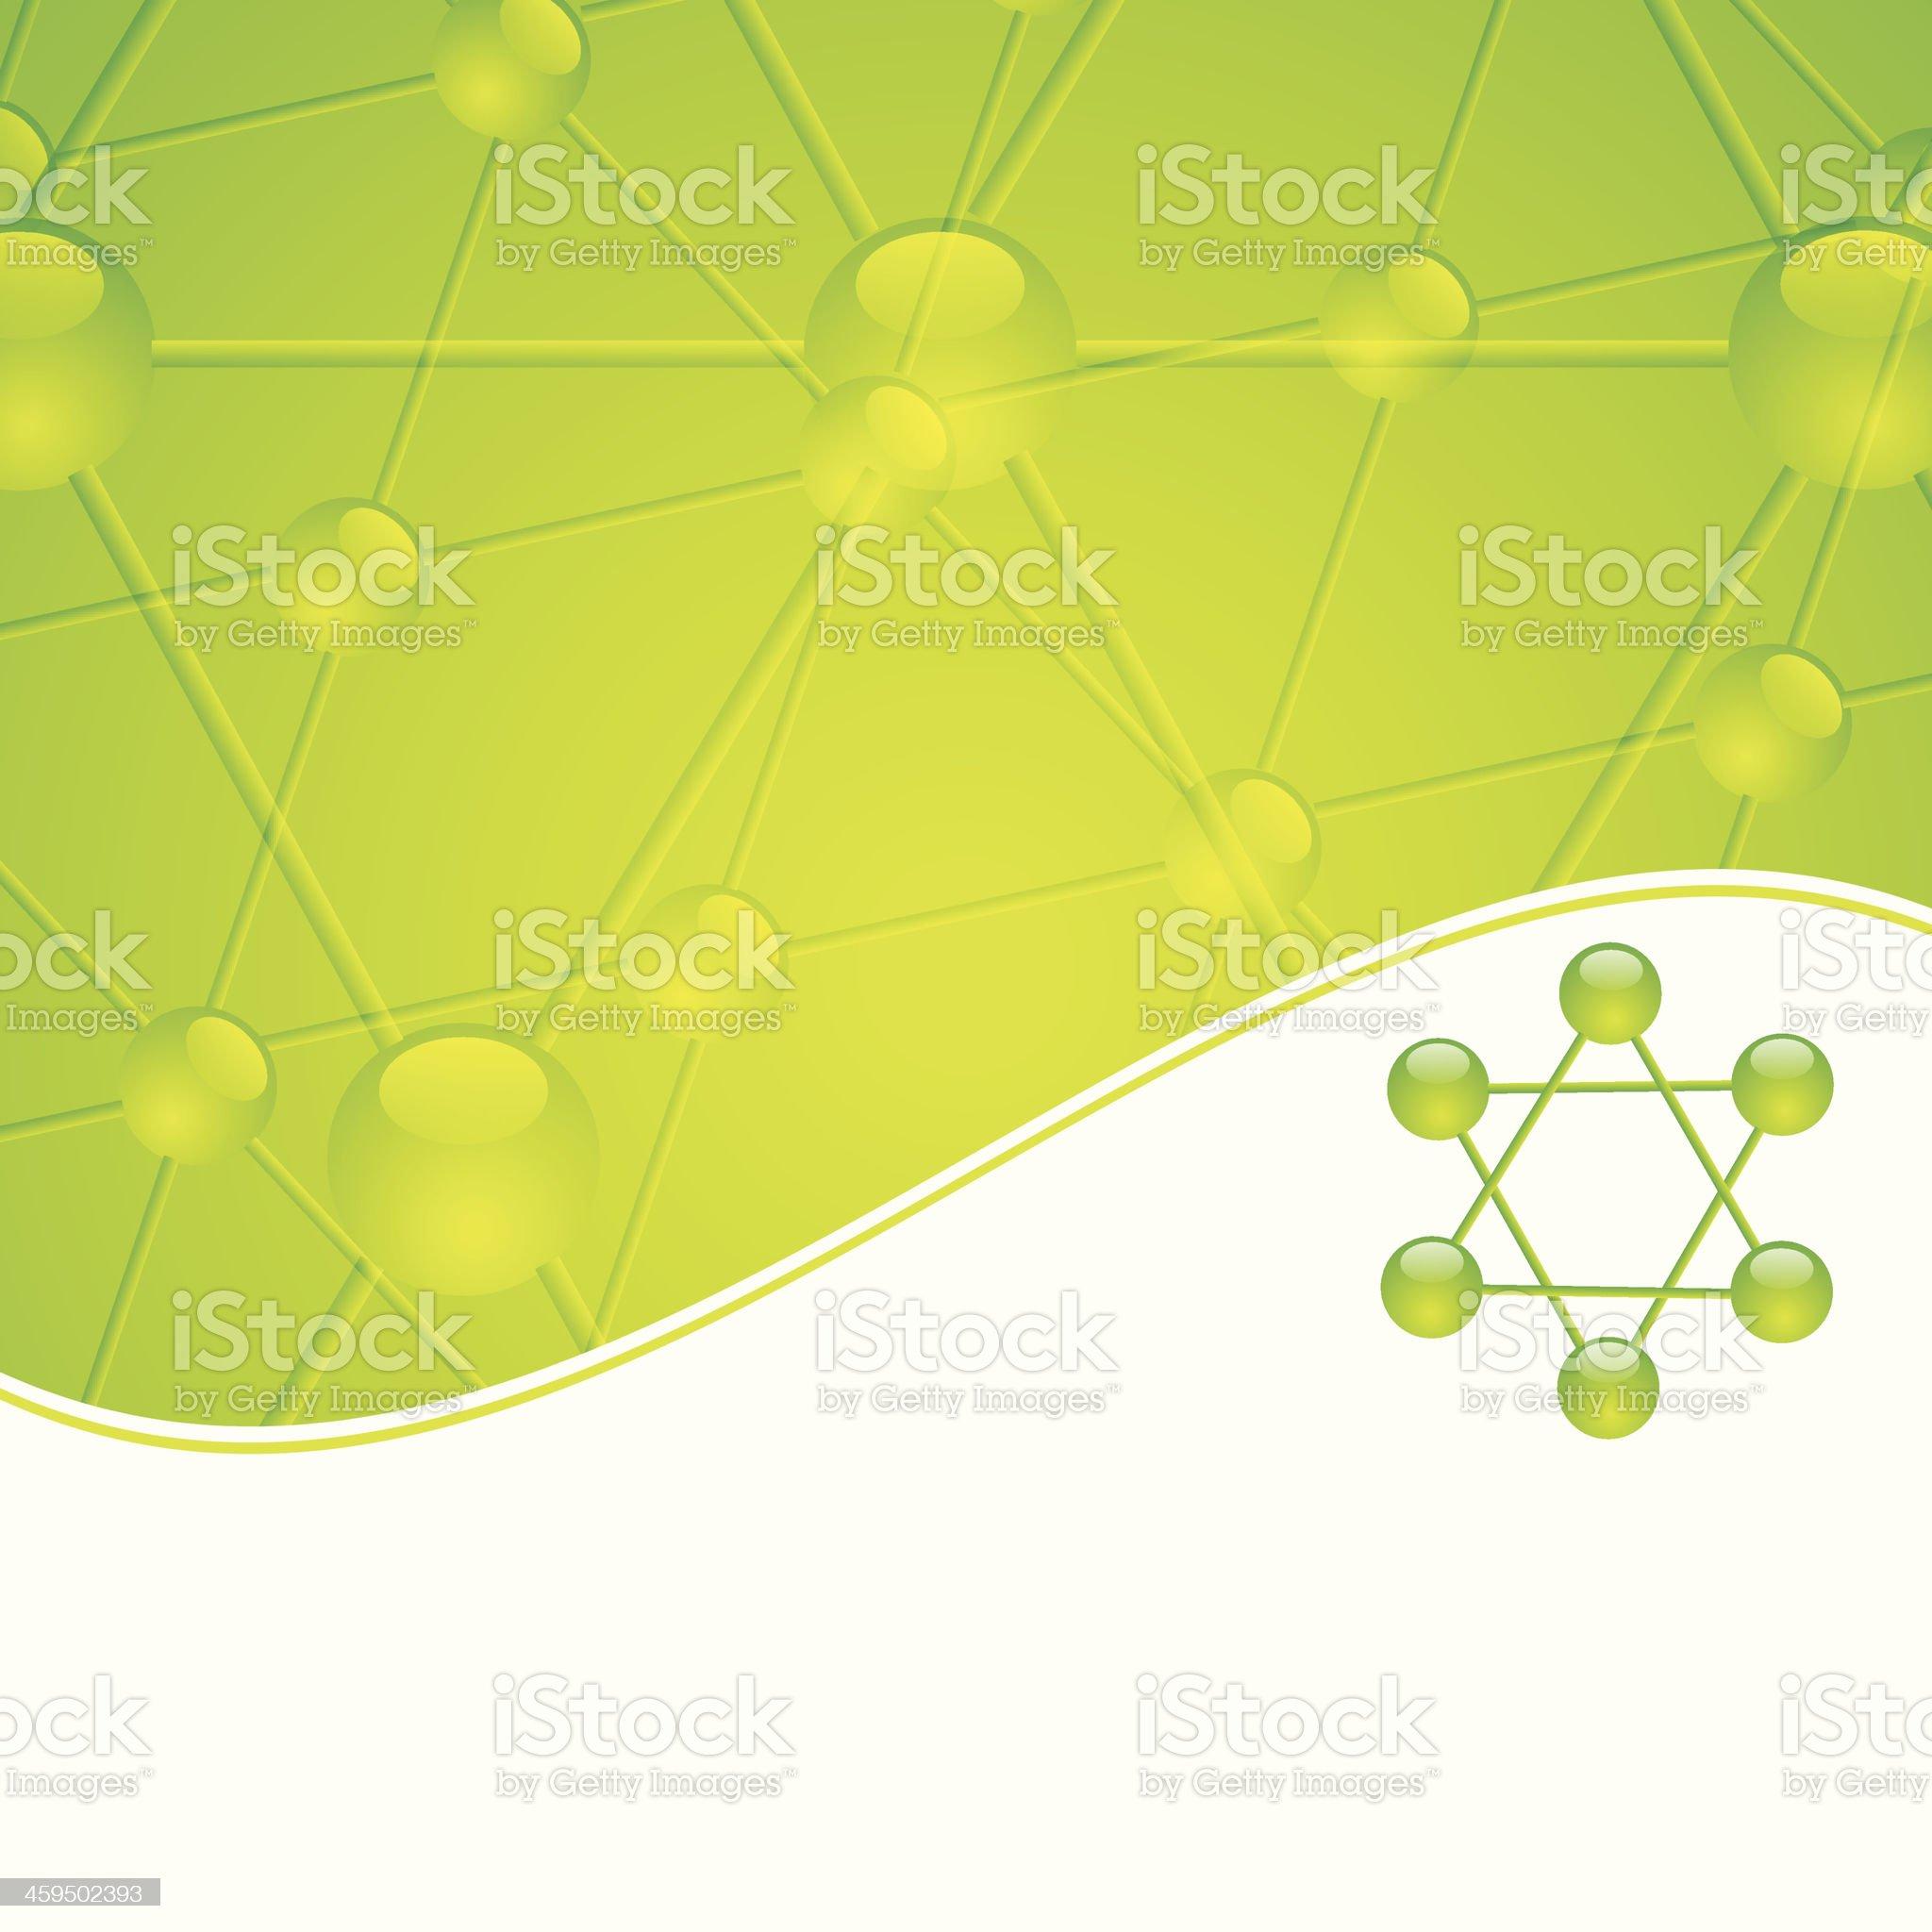 Molecule illustration green background royalty-free stock vector art